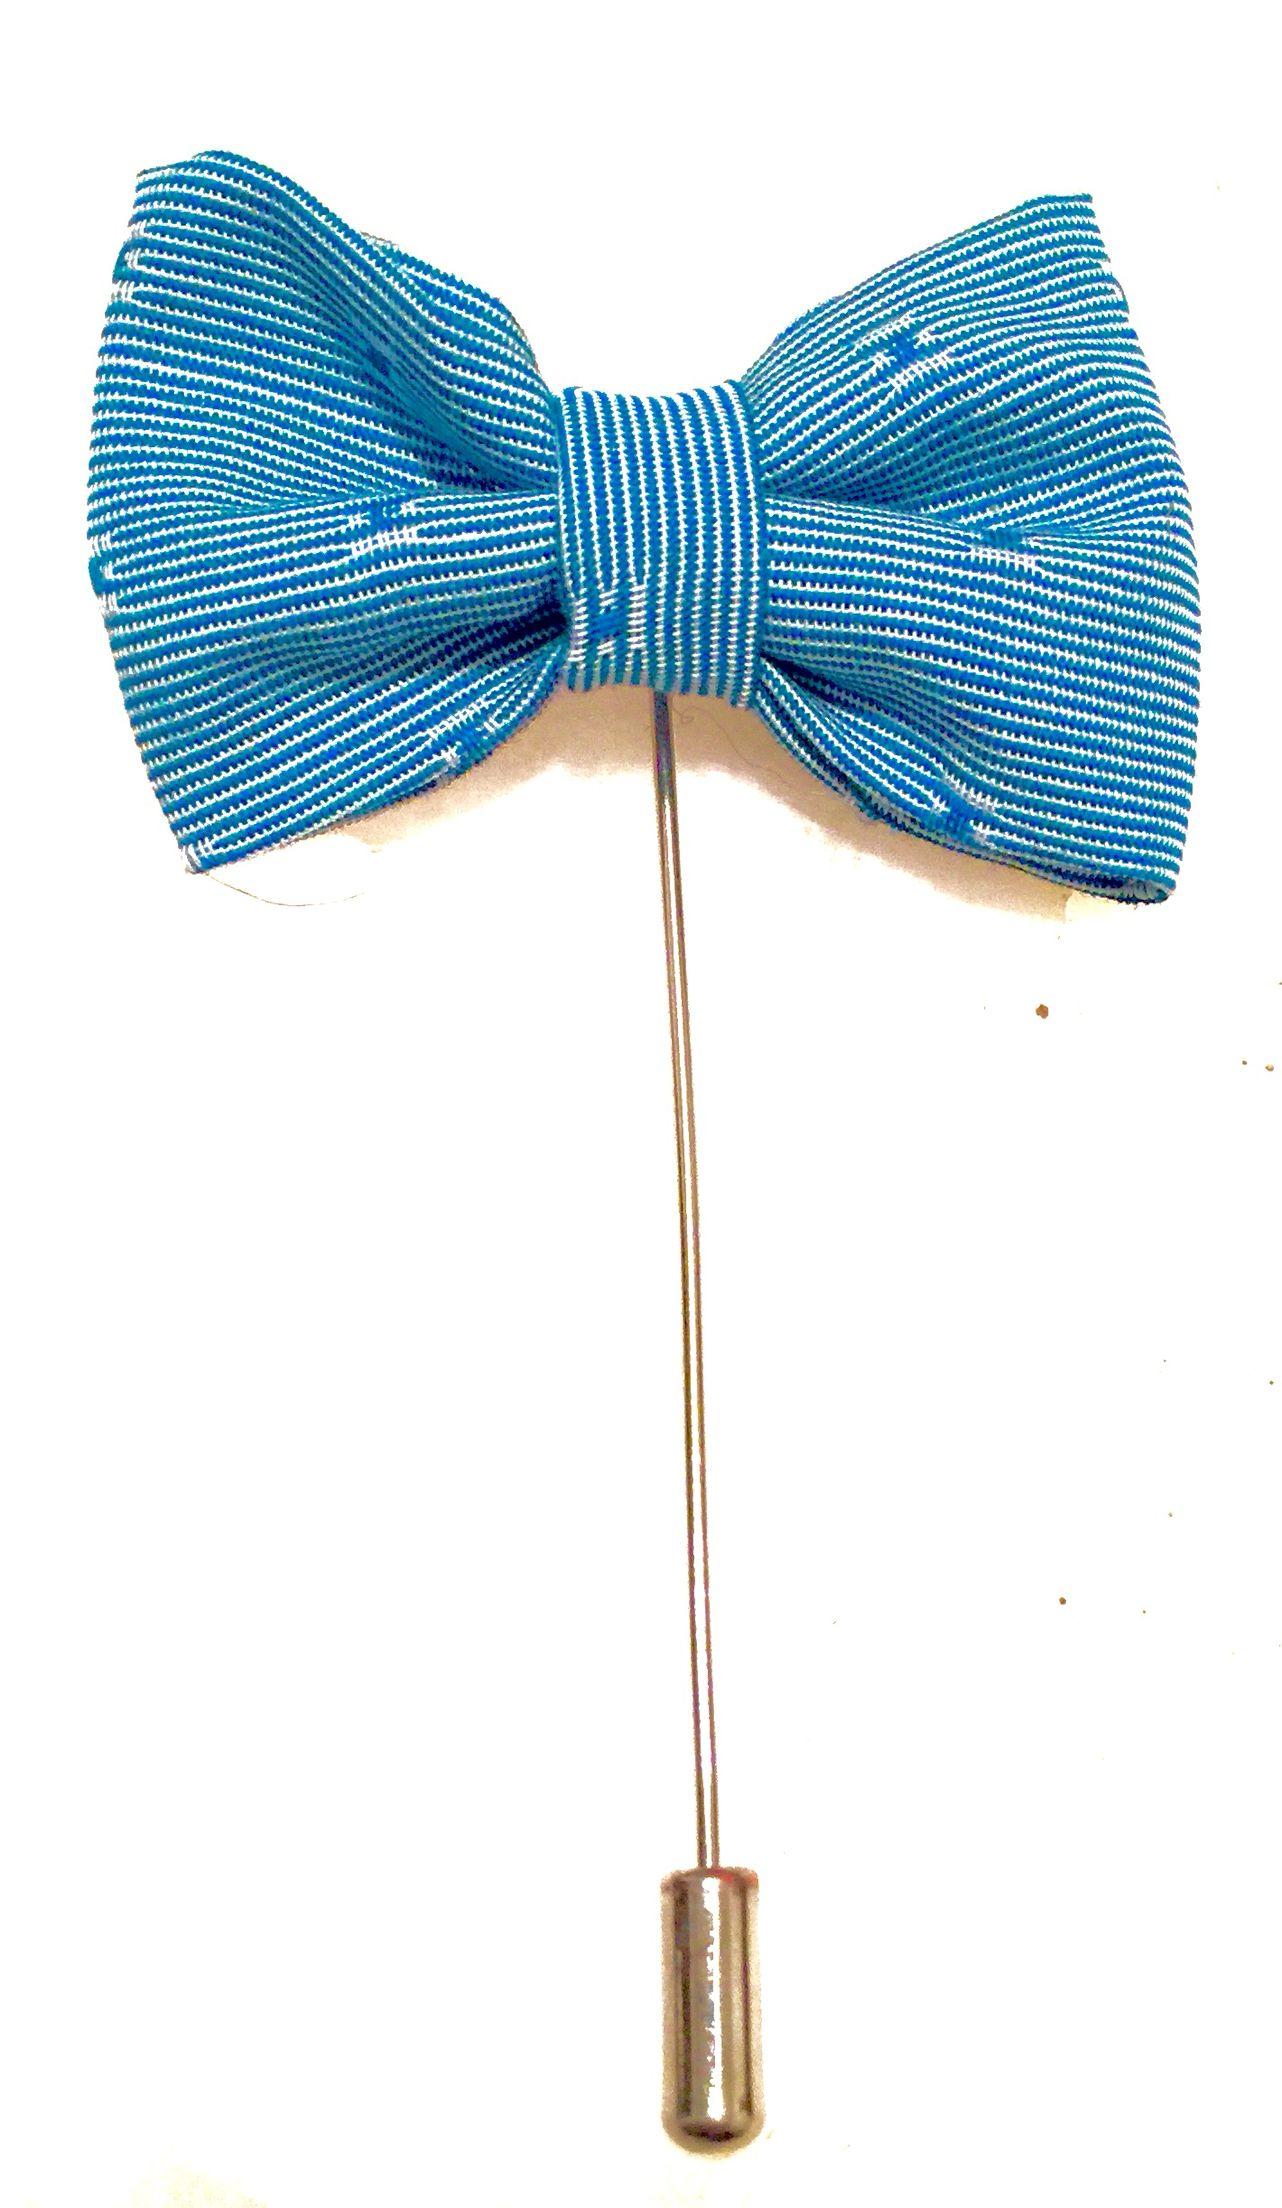 BowTie LapelPin by #DandyMakers realizados artesanalmente 8x4cm available: www.facebook.com/dandymakers Twitter & Instagram @DandyMakers